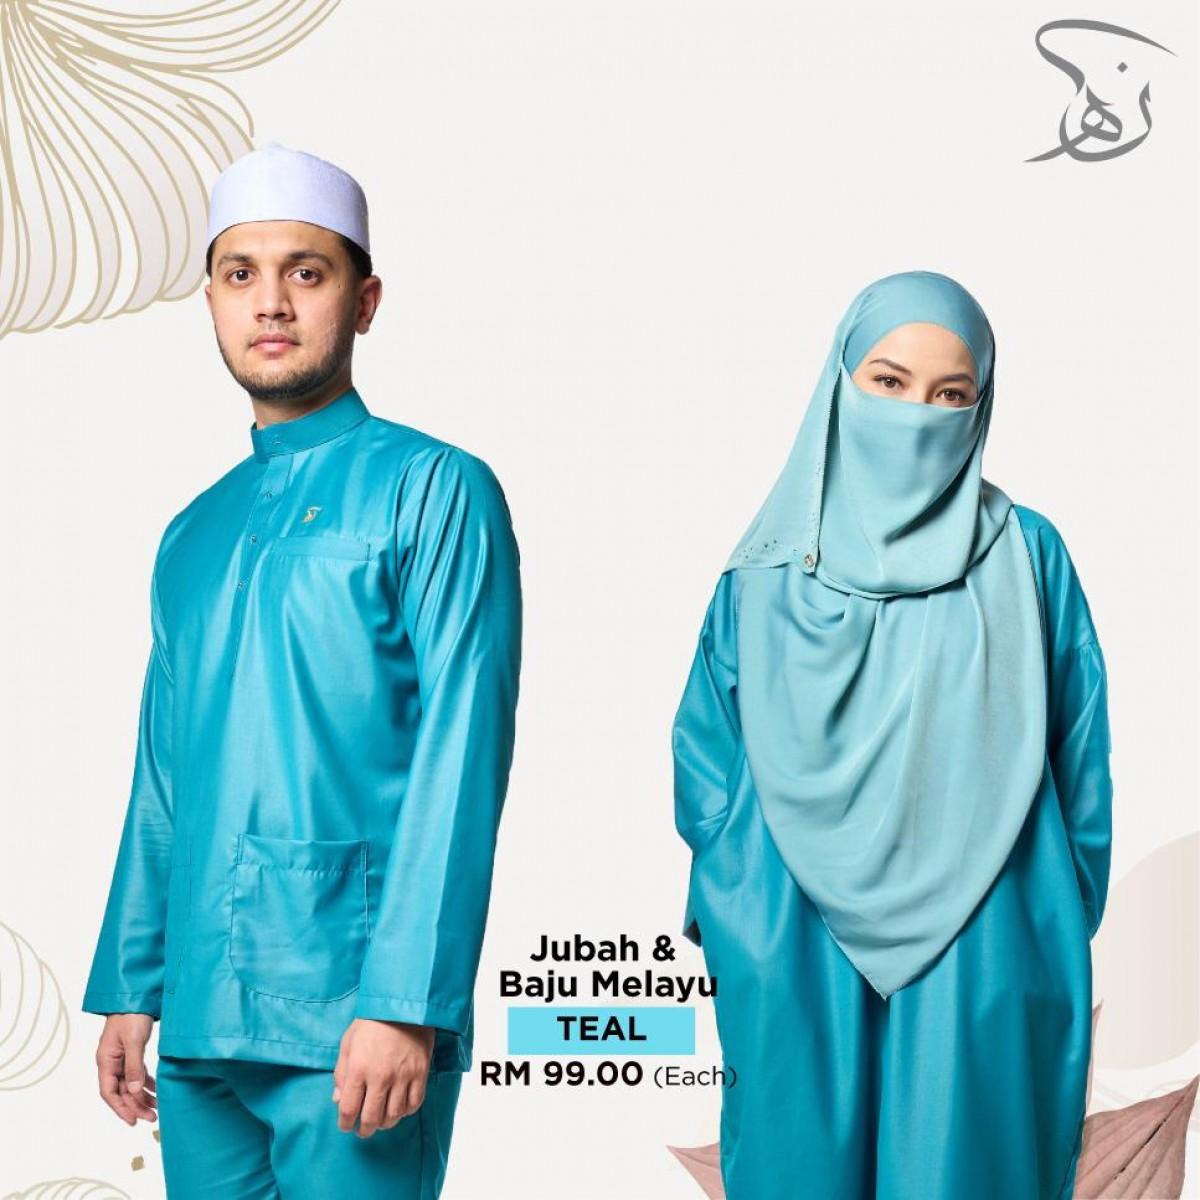 Set Couple Jubah & Baju Melayu - Teal - MARKAZ TIJAARI